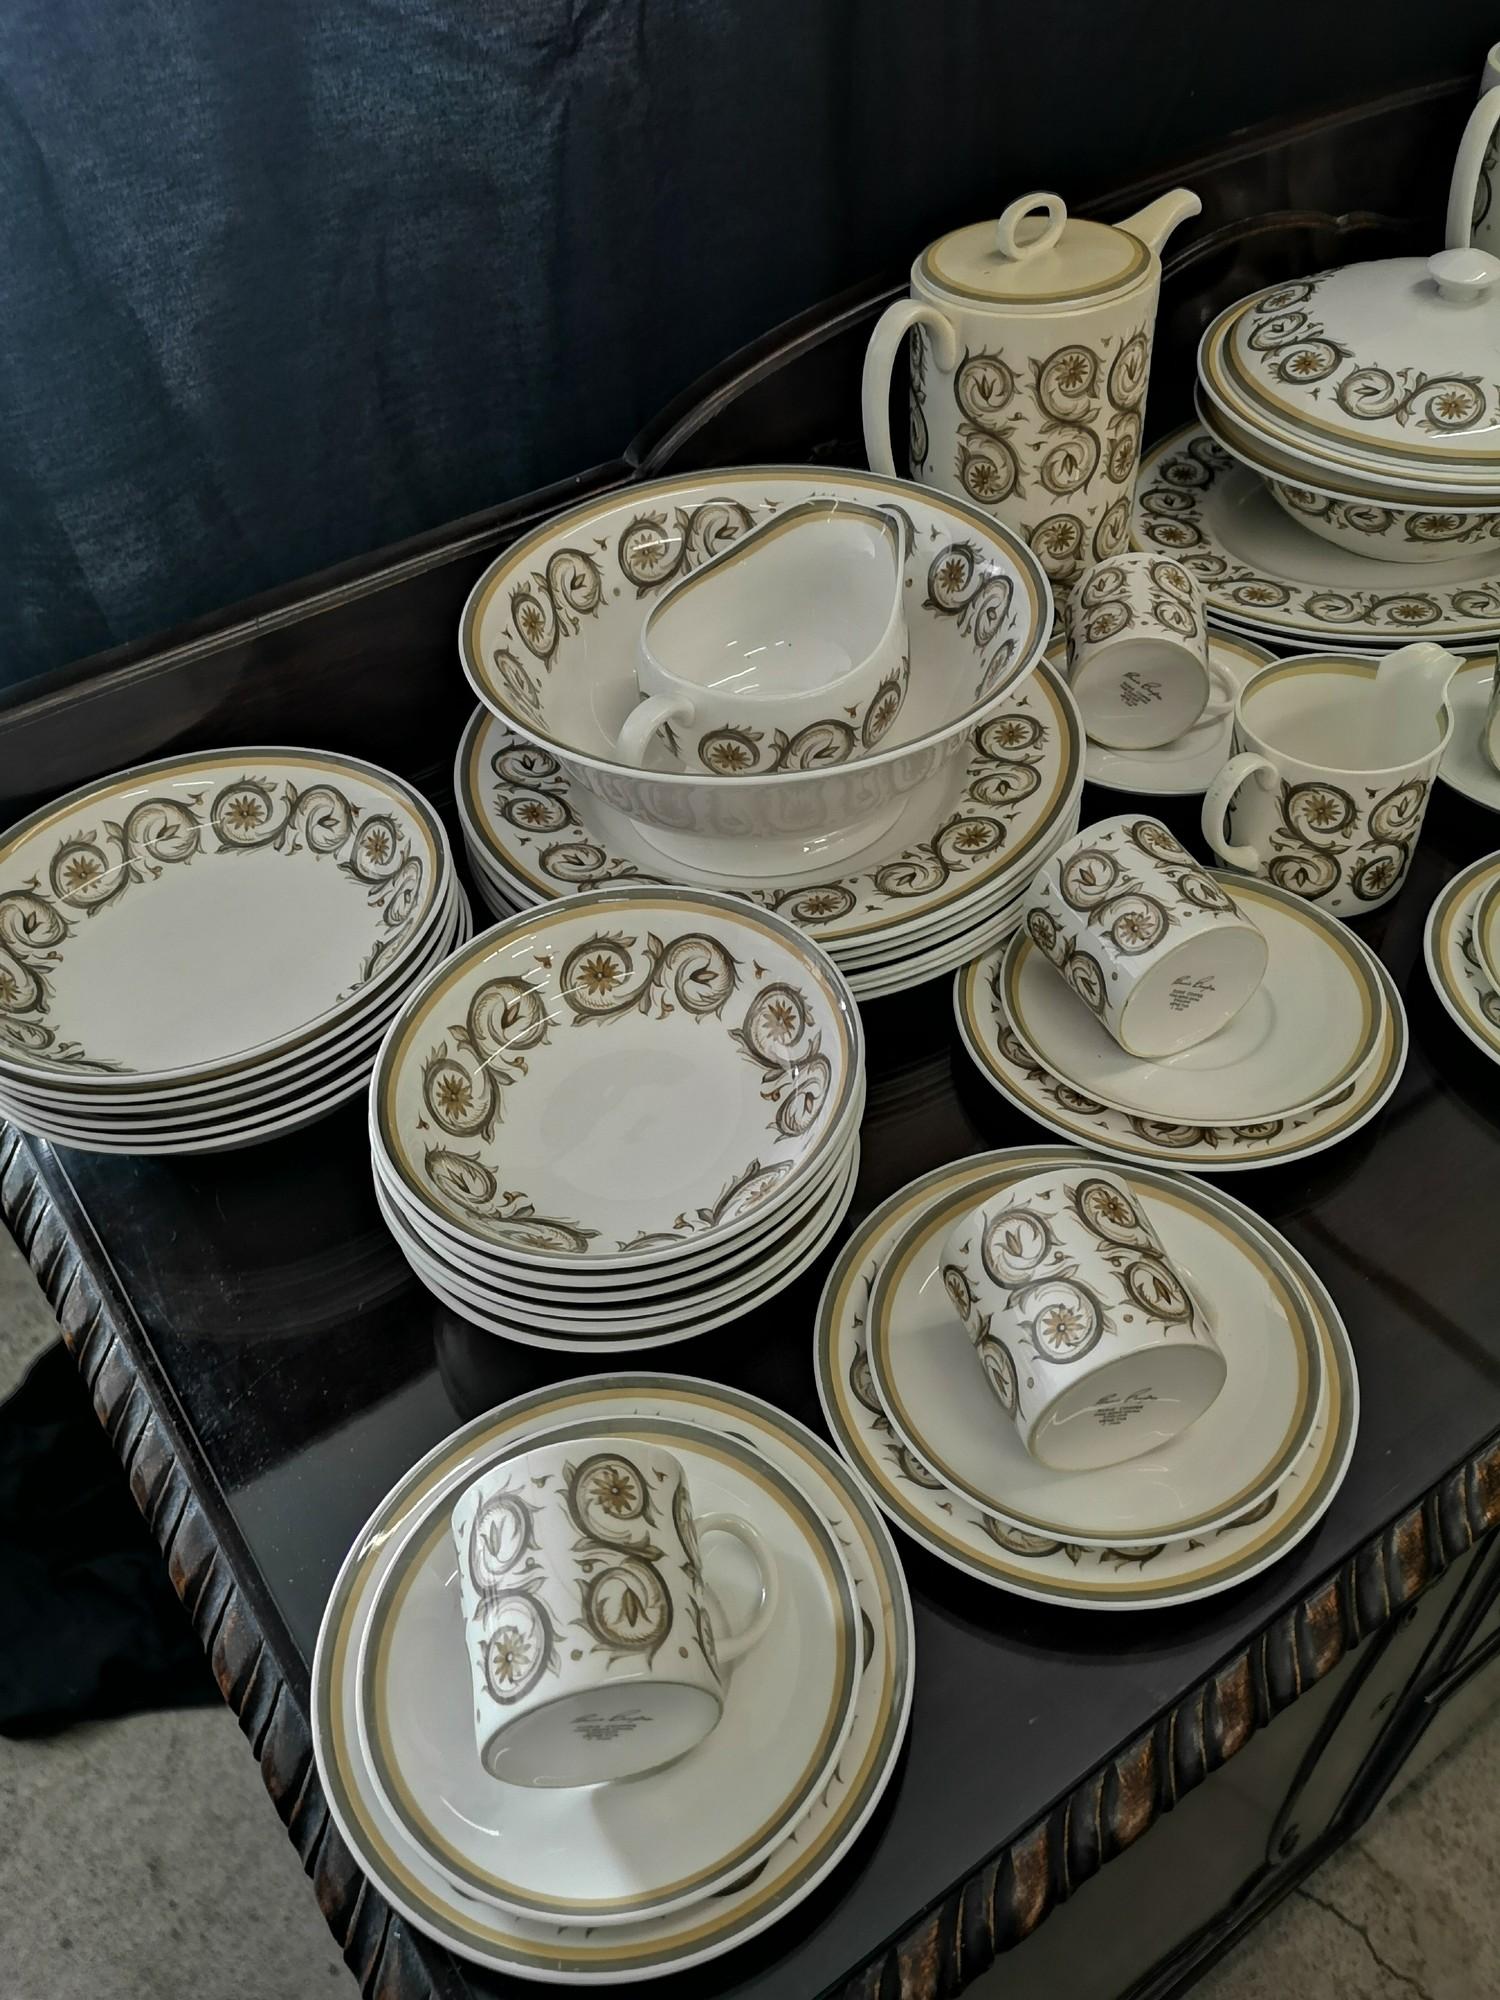 Large suzie Cooper retro venetia pattern tea & dinner service includes tureen tea pots etc. - Image 4 of 5